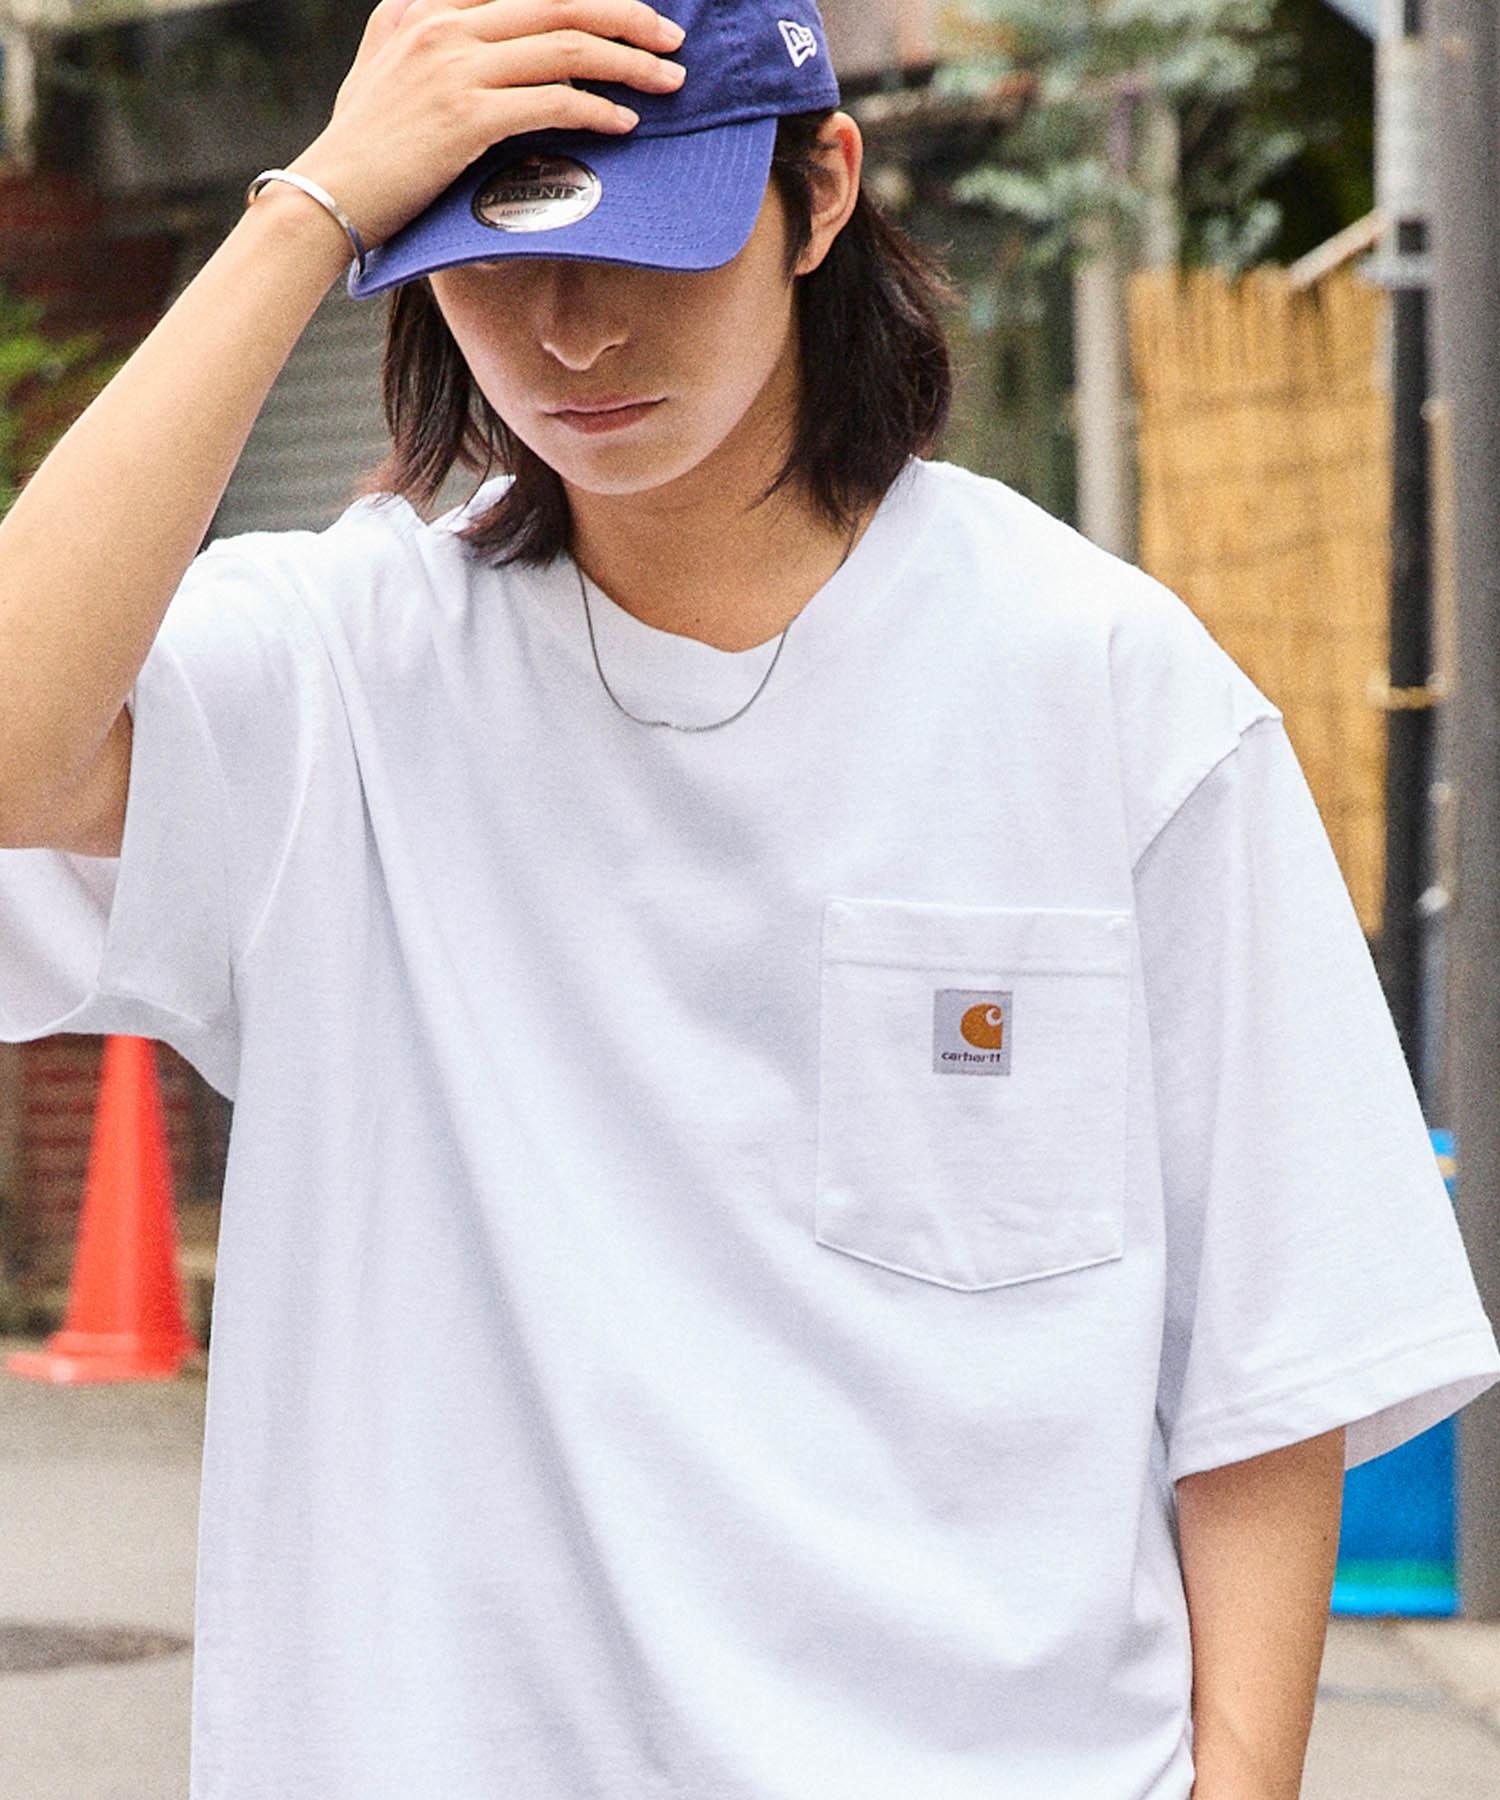 carhartt(カーハート) ビッグシルエット ポケット半袖 ロゴ Tシャツ Workwear Pocket 1/2 Sleeve T-Shirts